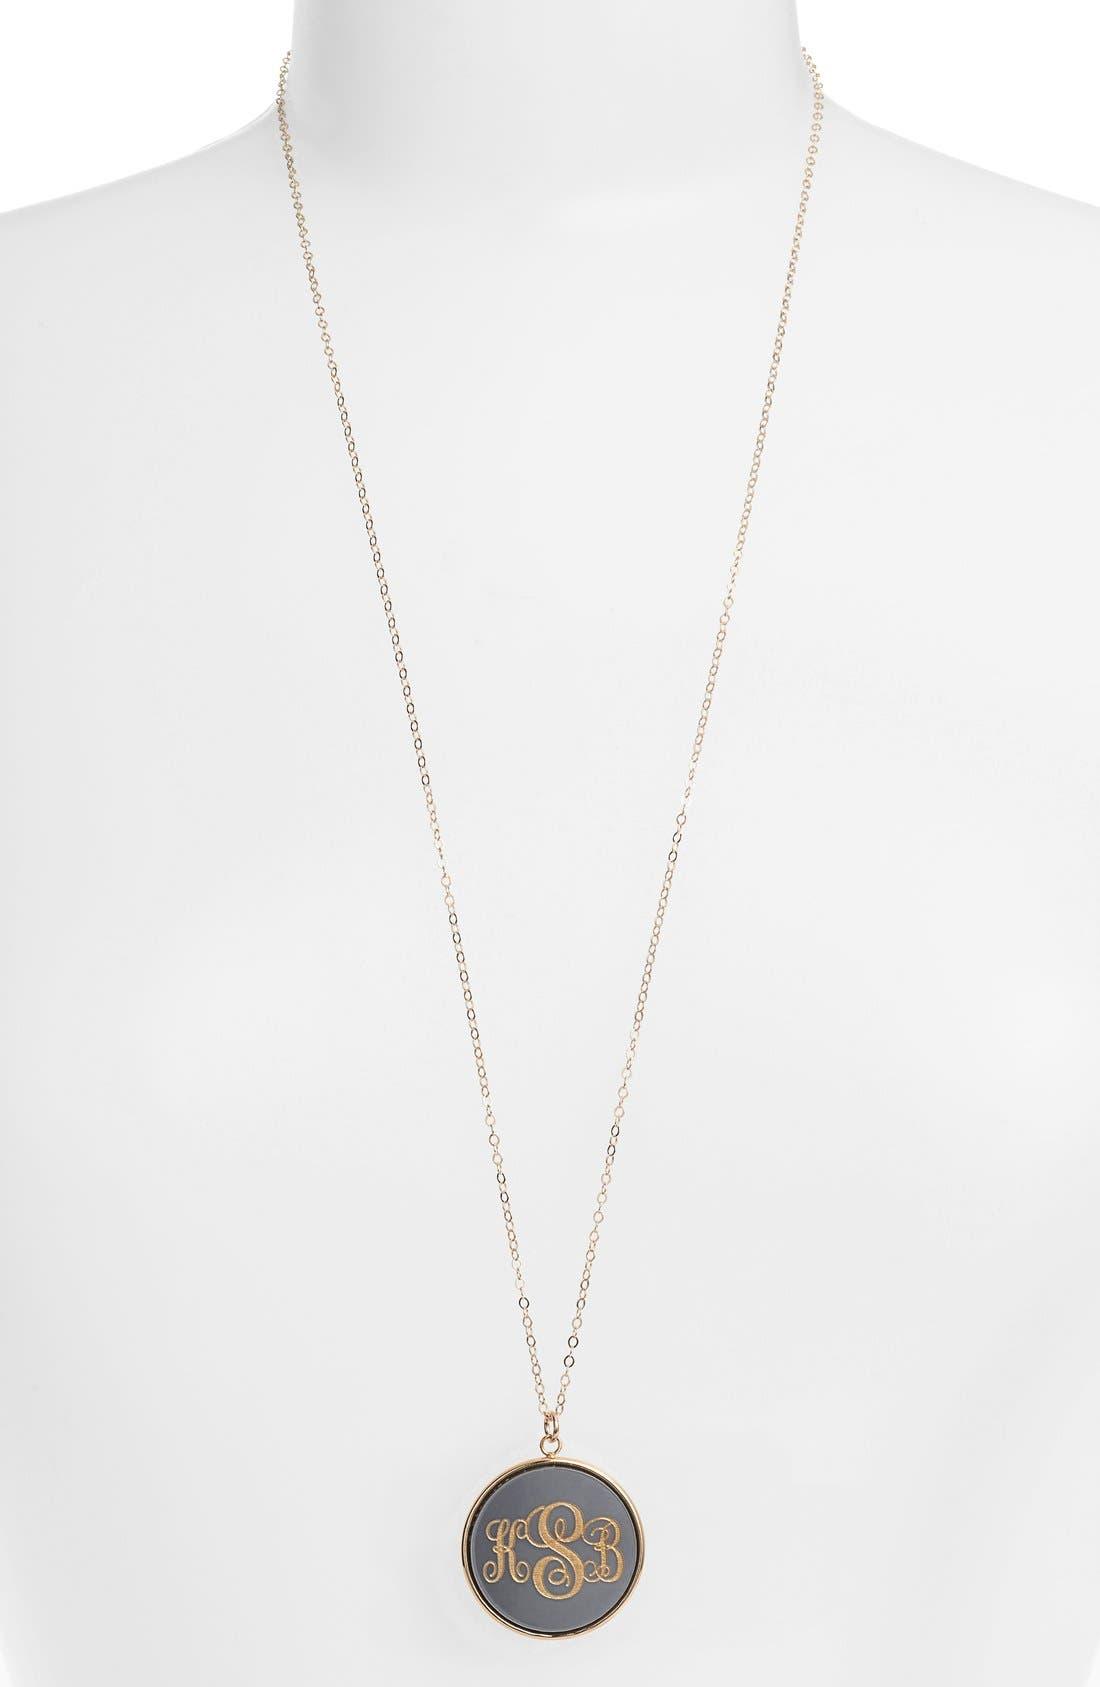 'Vineyard' Personalized Monogram Pendant Necklace,                         Main,                         color, GUNMETAL